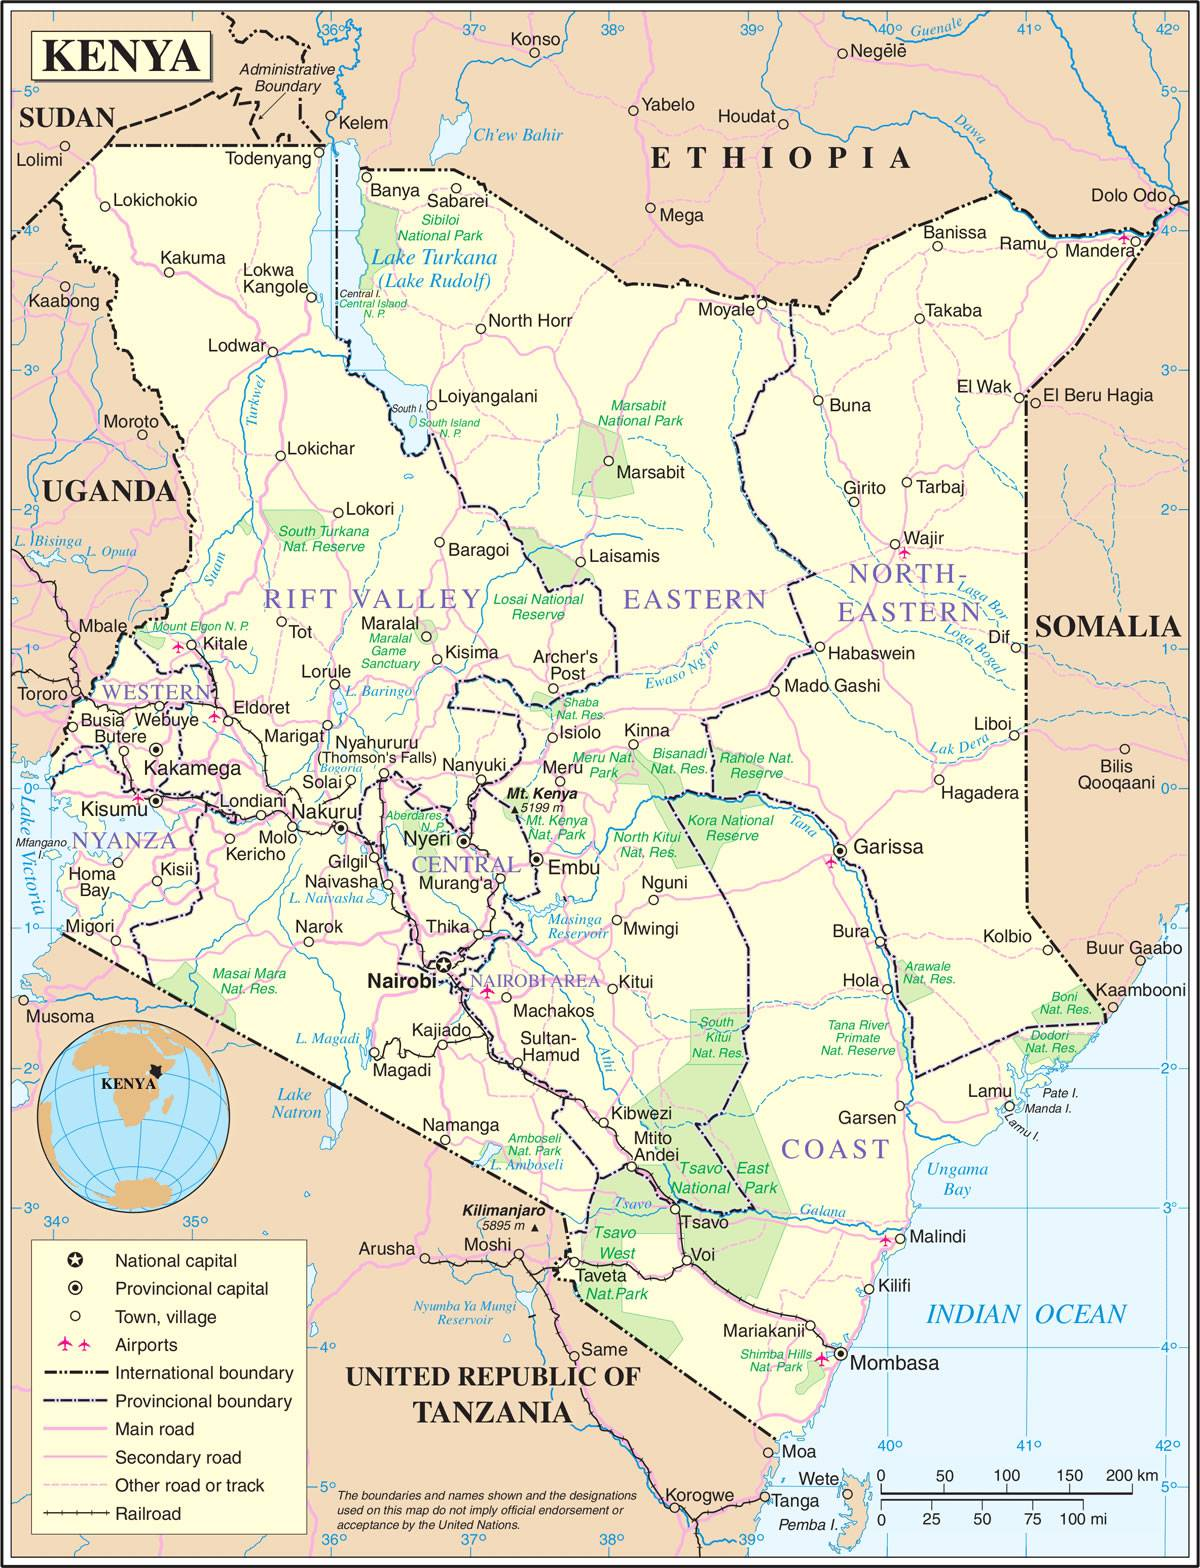 Carte détaillée du Kenya